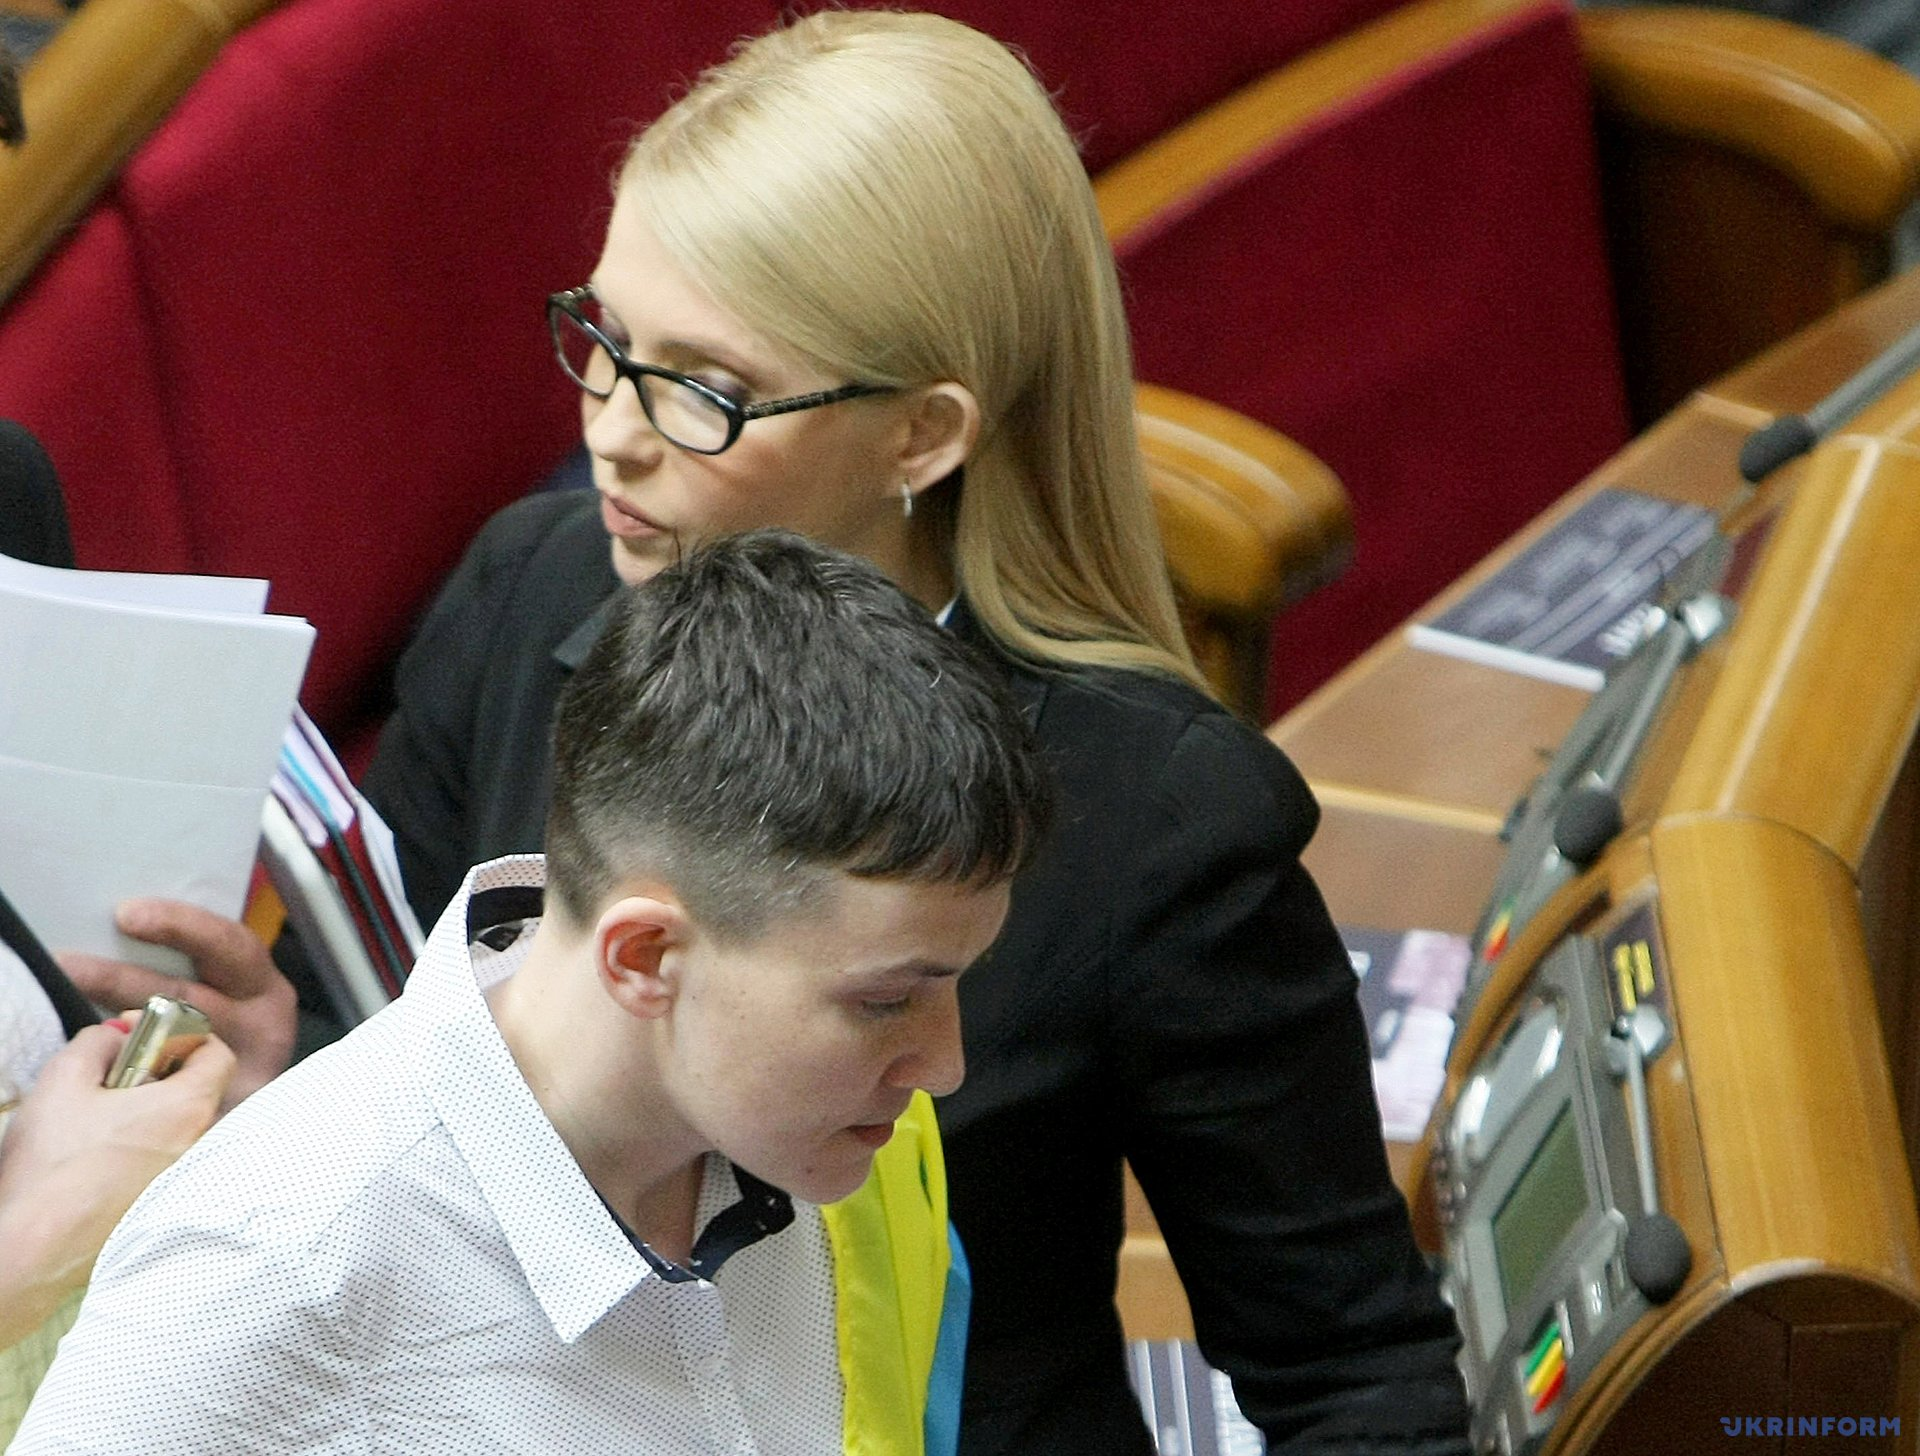 Юлия Тимошенко и Надежда Савченко во время заседания парламента / Фото: Владимир Тарасов, Укринформ